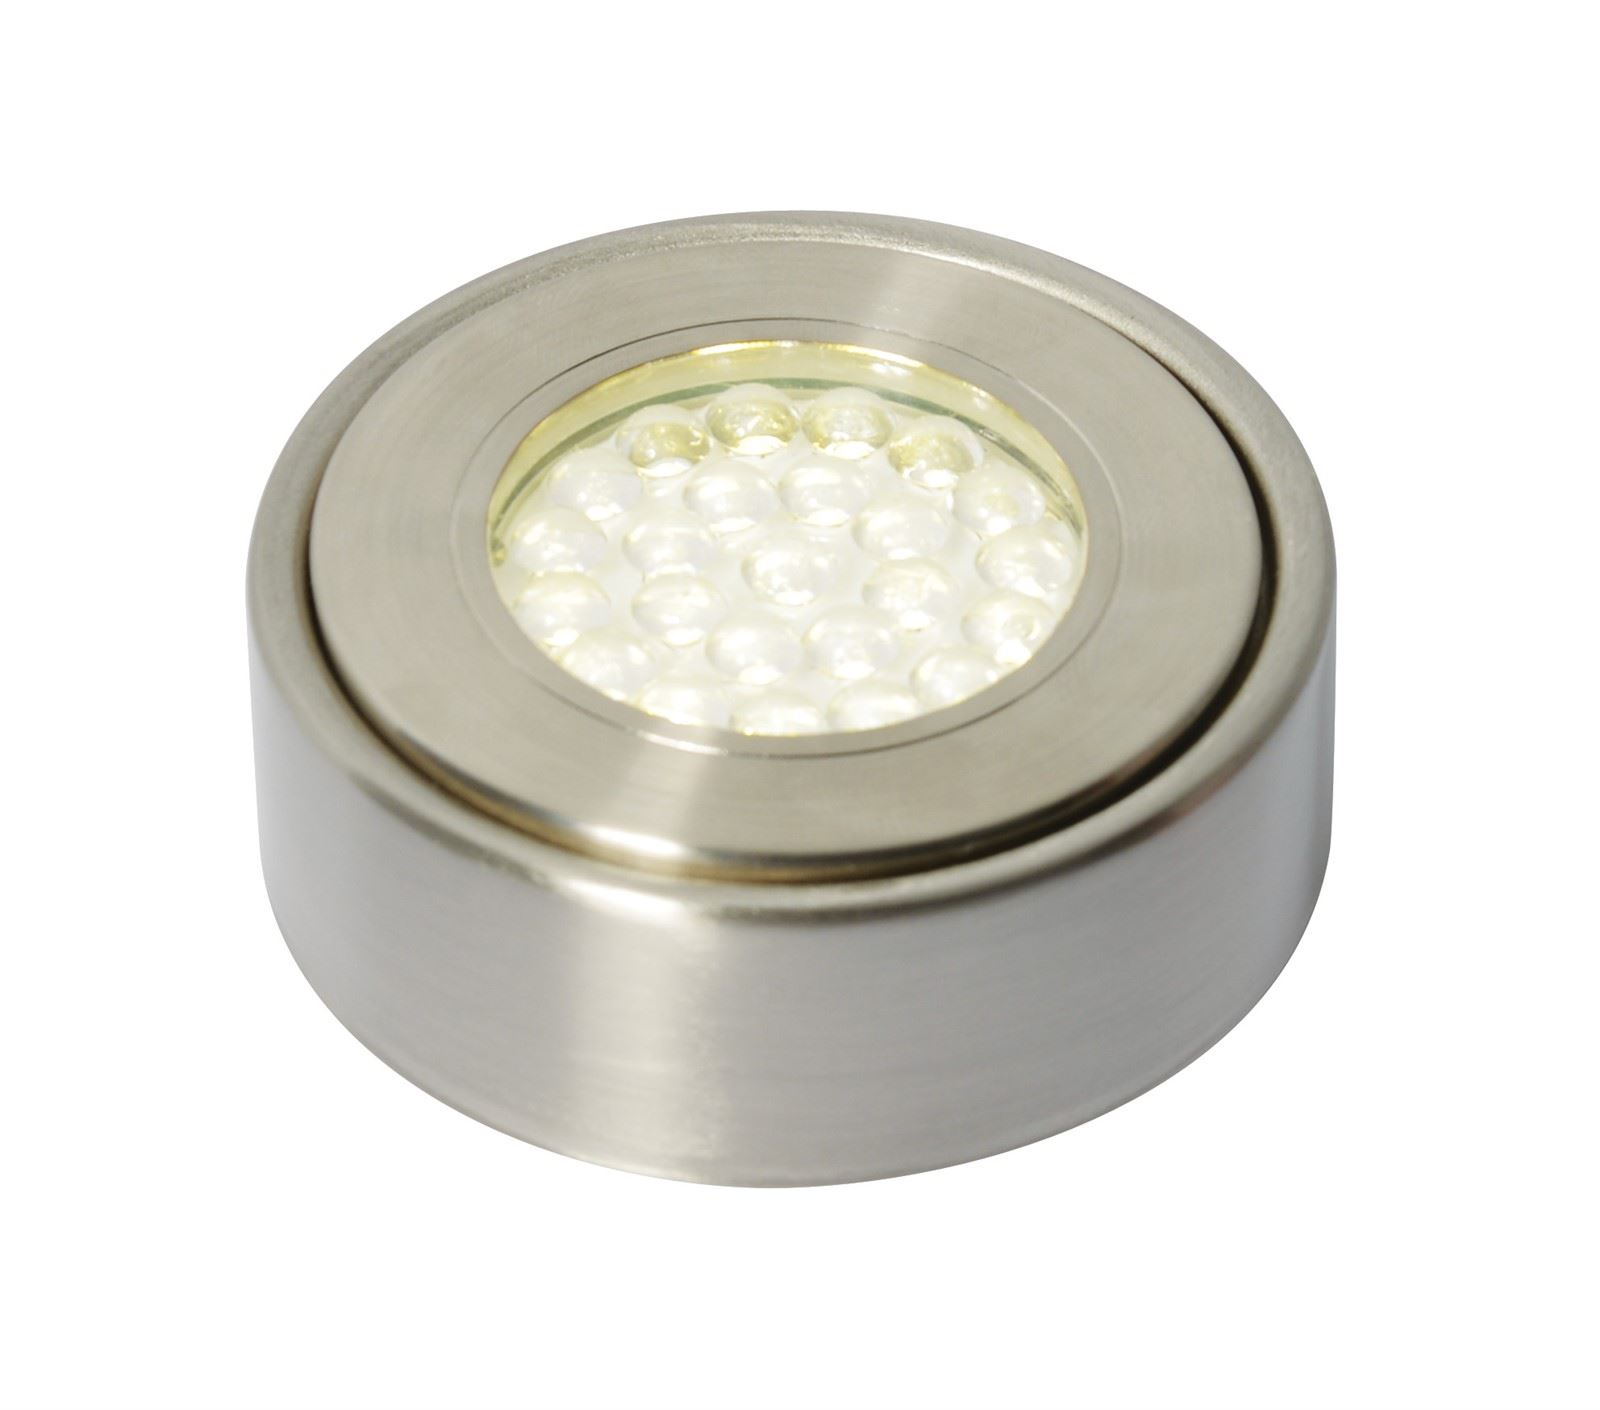 Laghetto Led, Mains Voltage, Circular Cabinet Light, 6000K Day Light